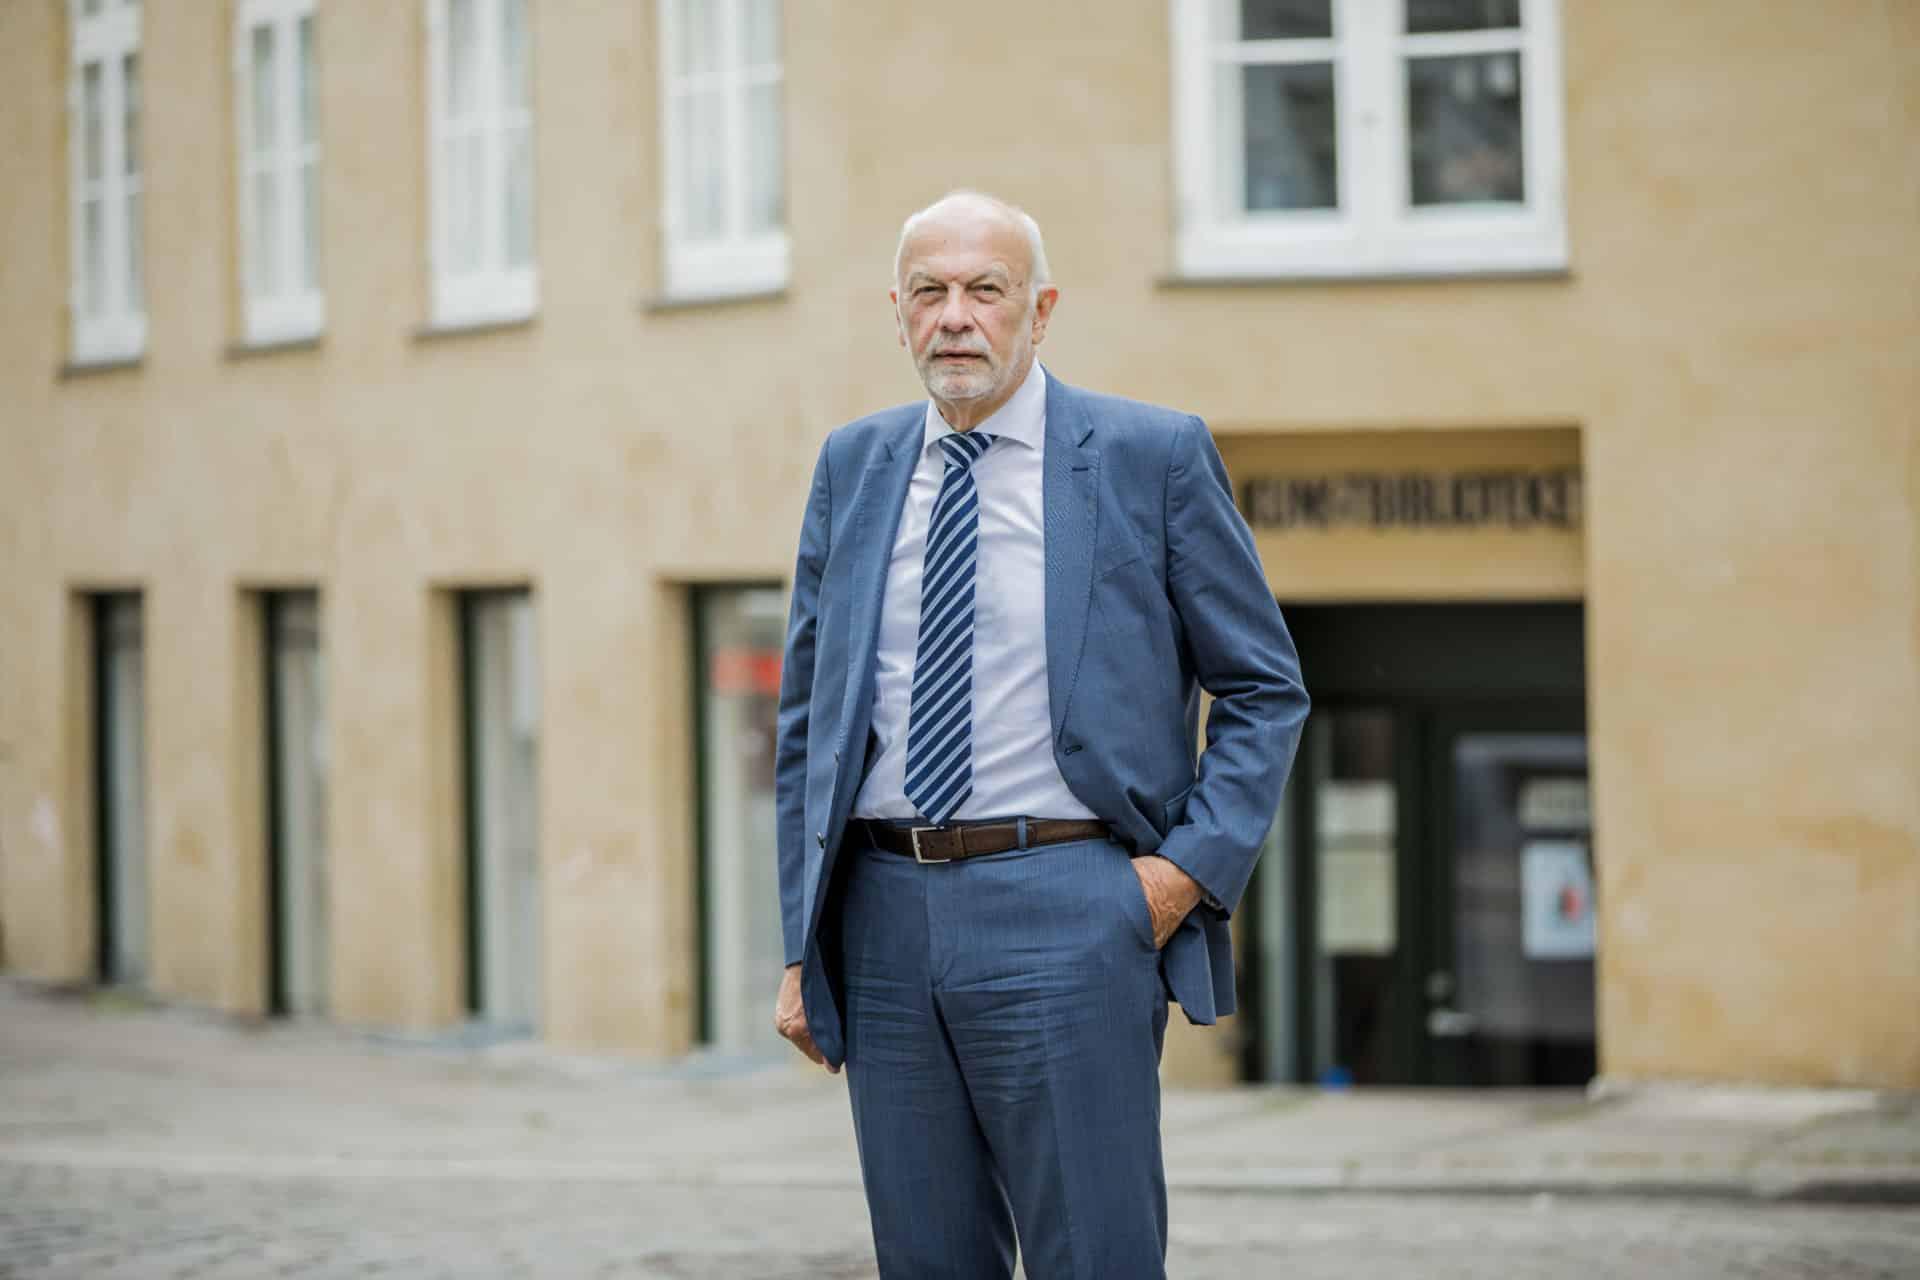 Poul Erik Bech